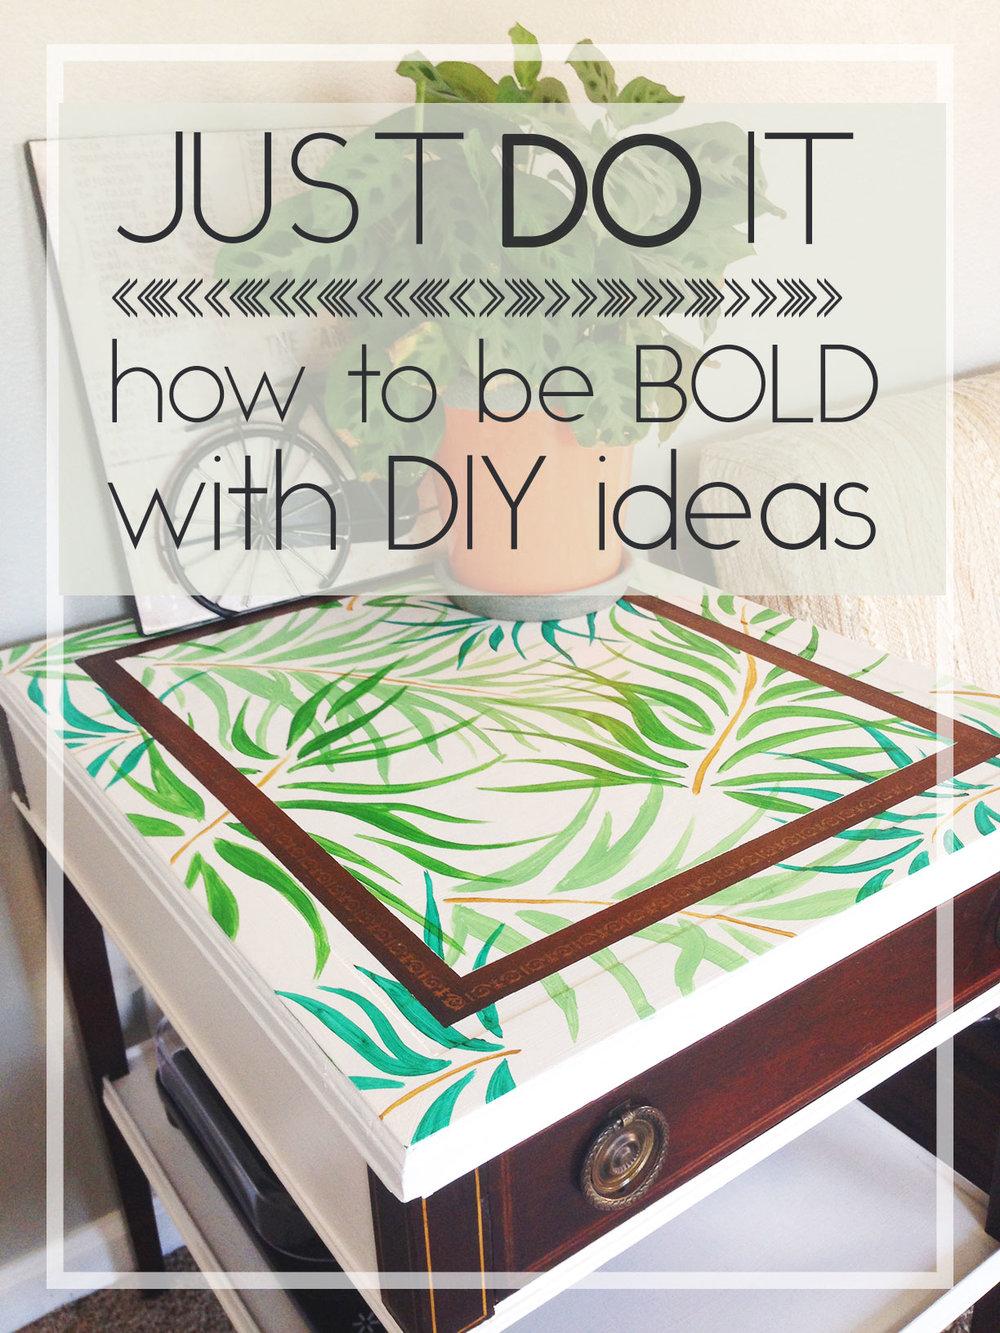 Be-Bold-Header-Image.jpg